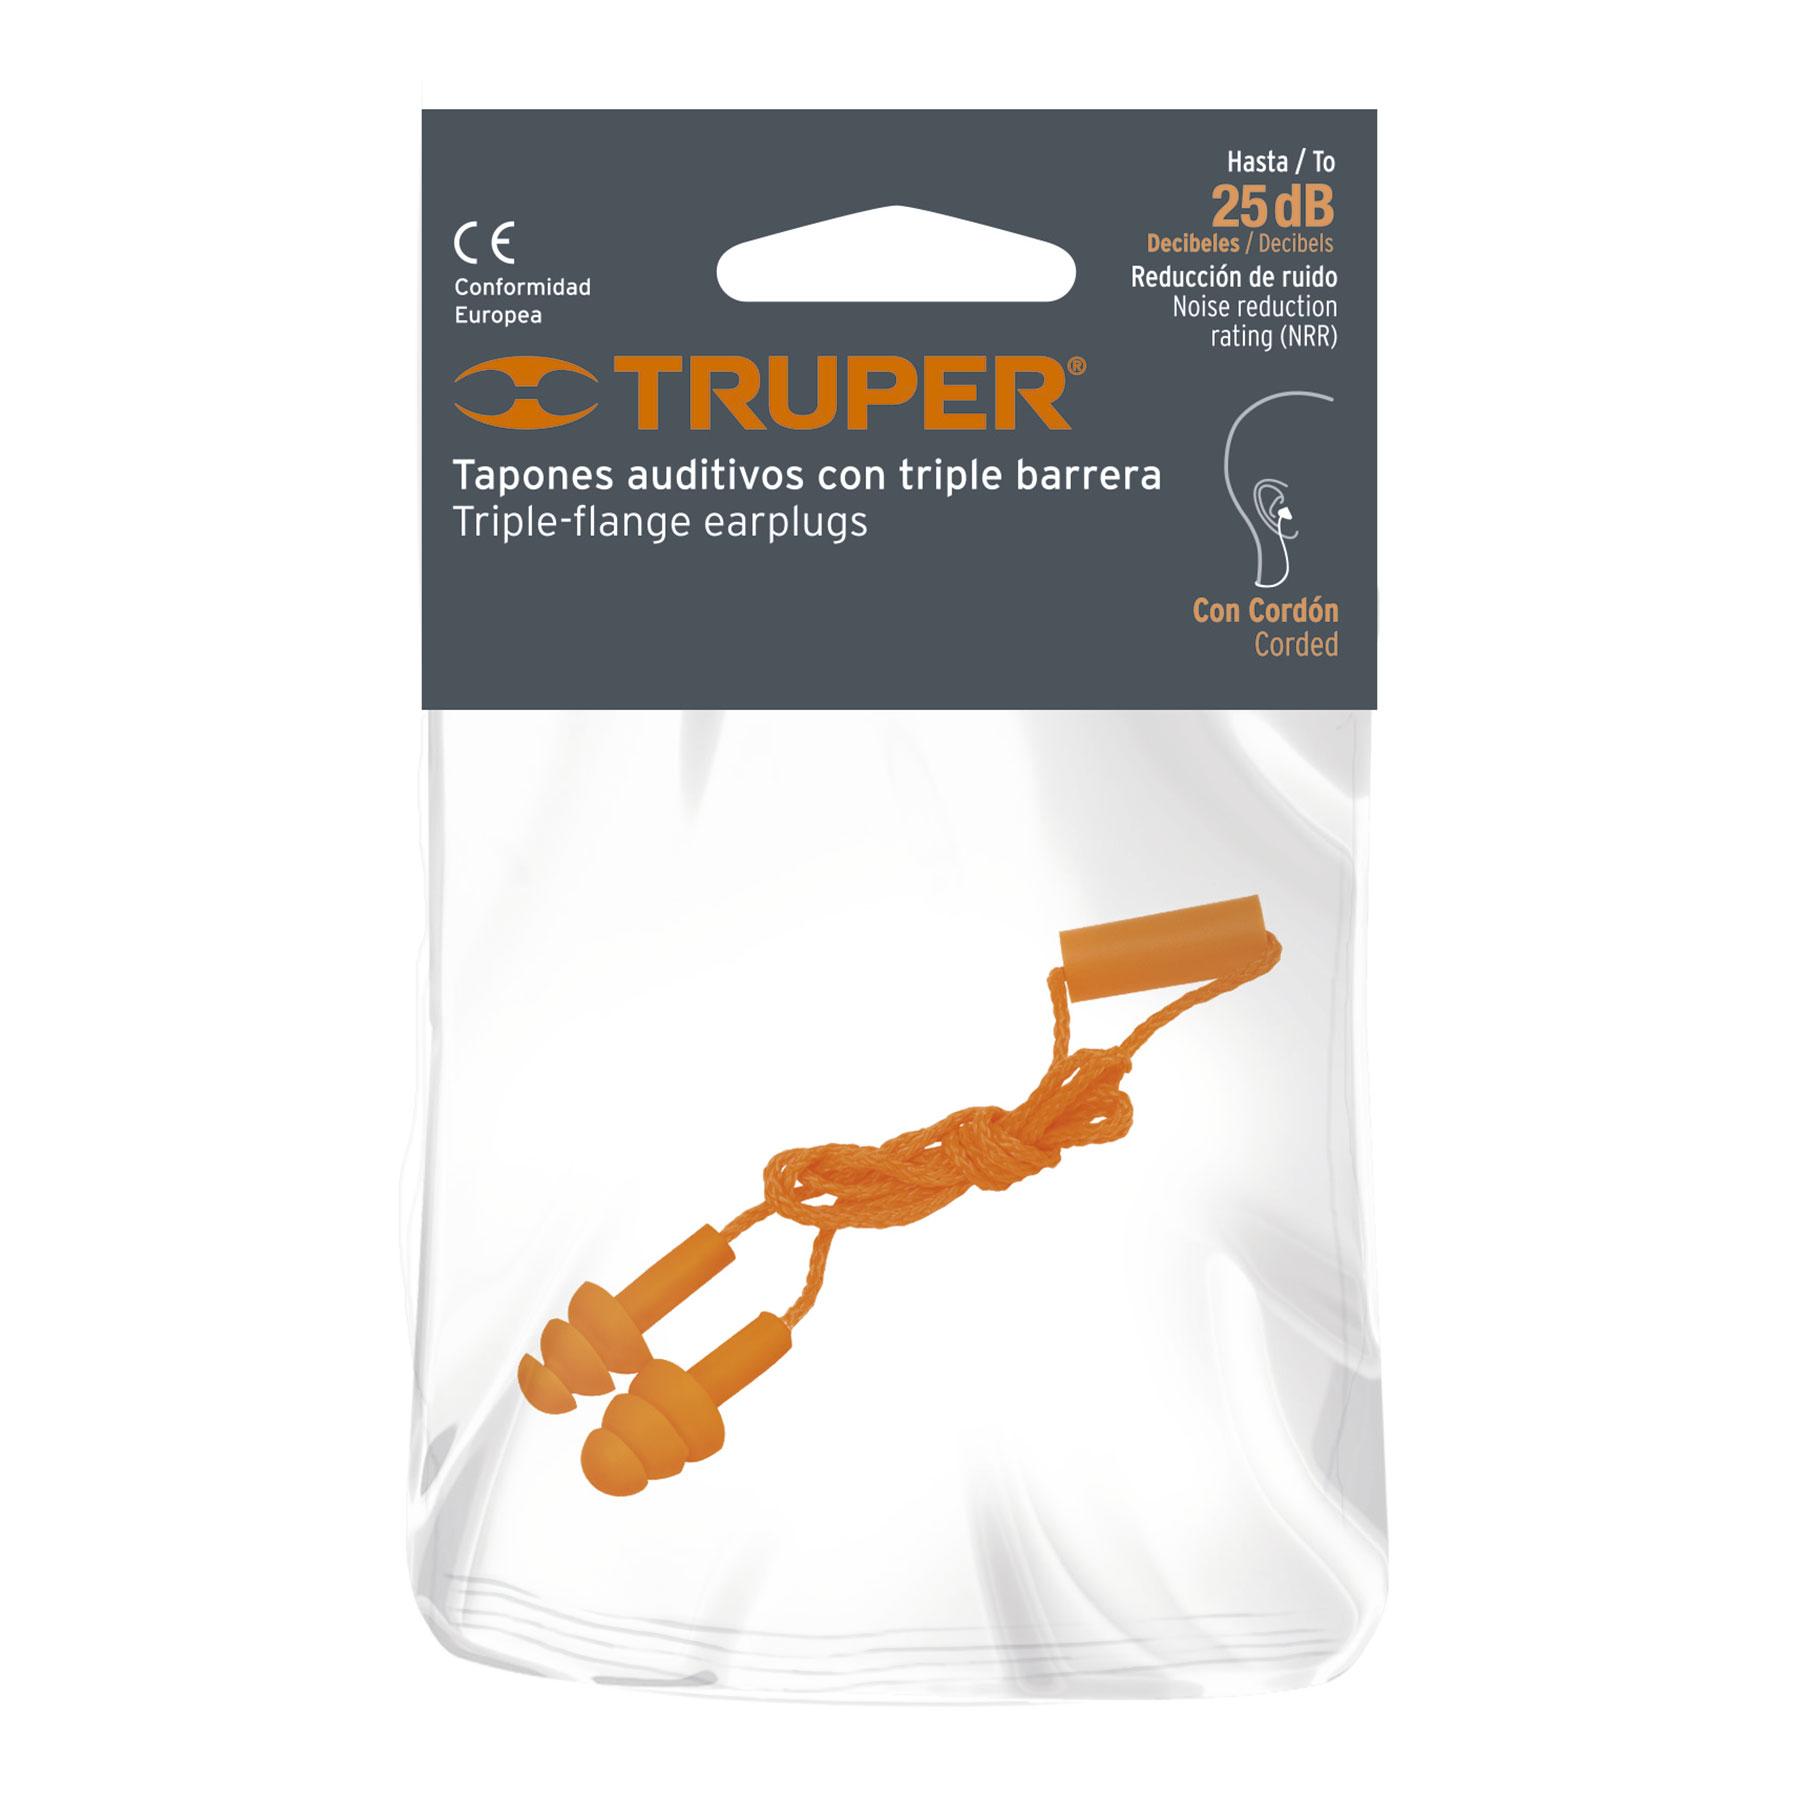 Truper - Tapón auditivo, reutilizable, triple barrera con cordón